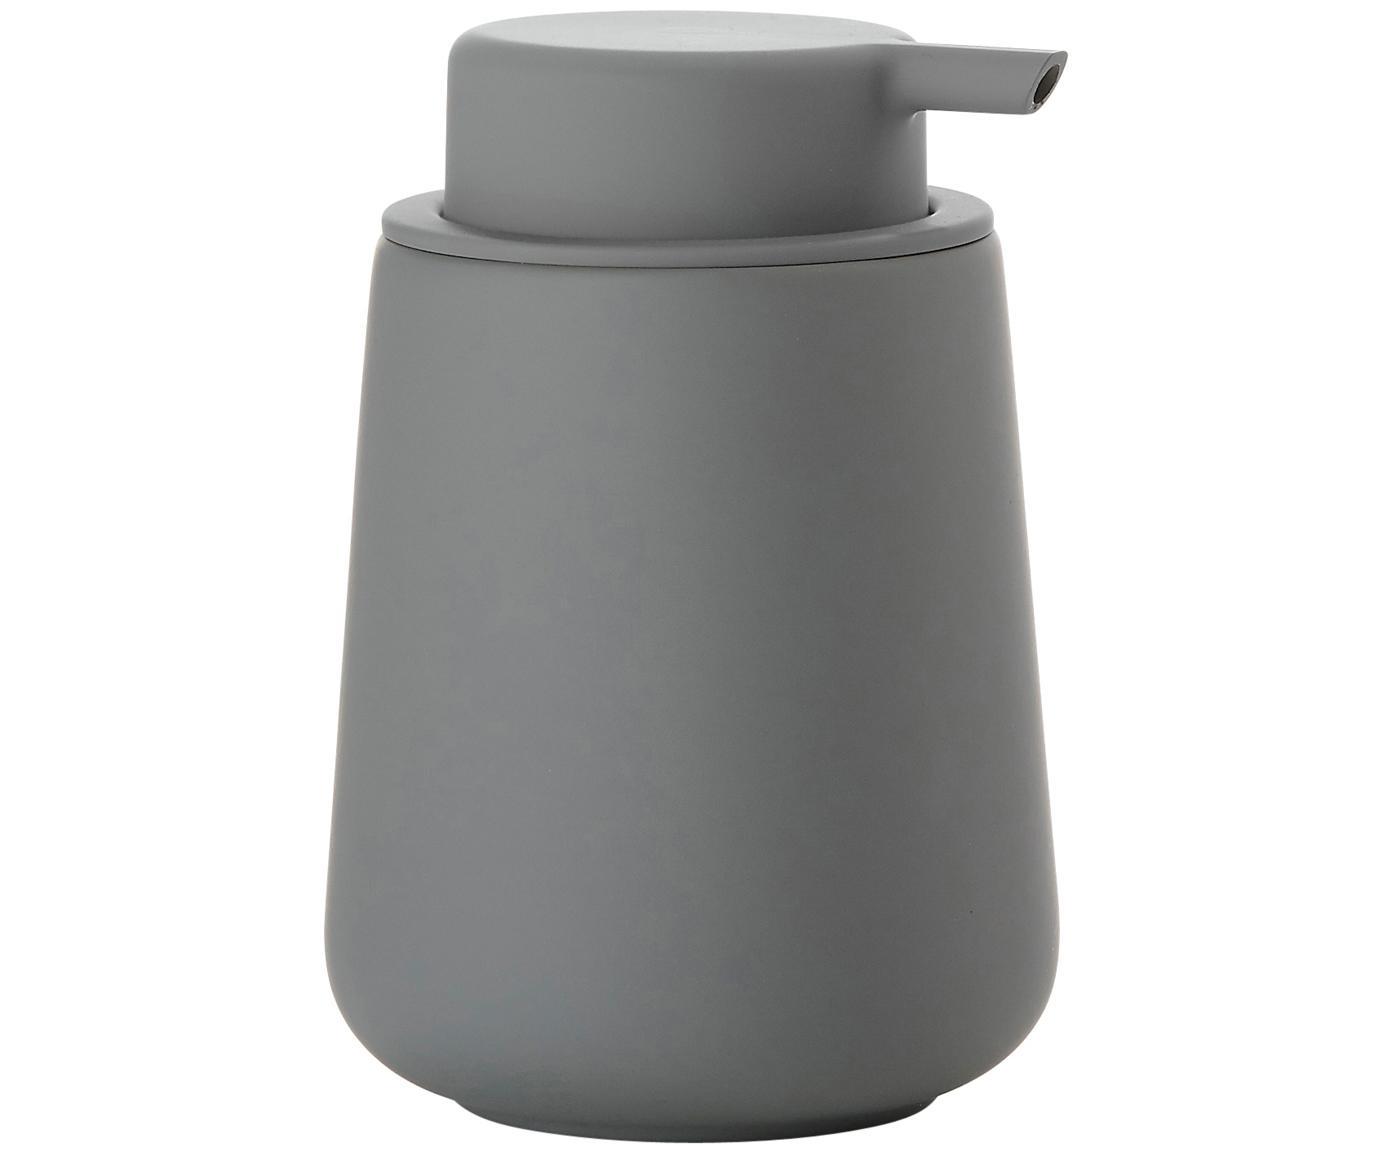 Dispenser sapone in porcellana Nova One, Contenitore: porcellana, Grigio, opaco, Ø 8 x Alt. 12 cm